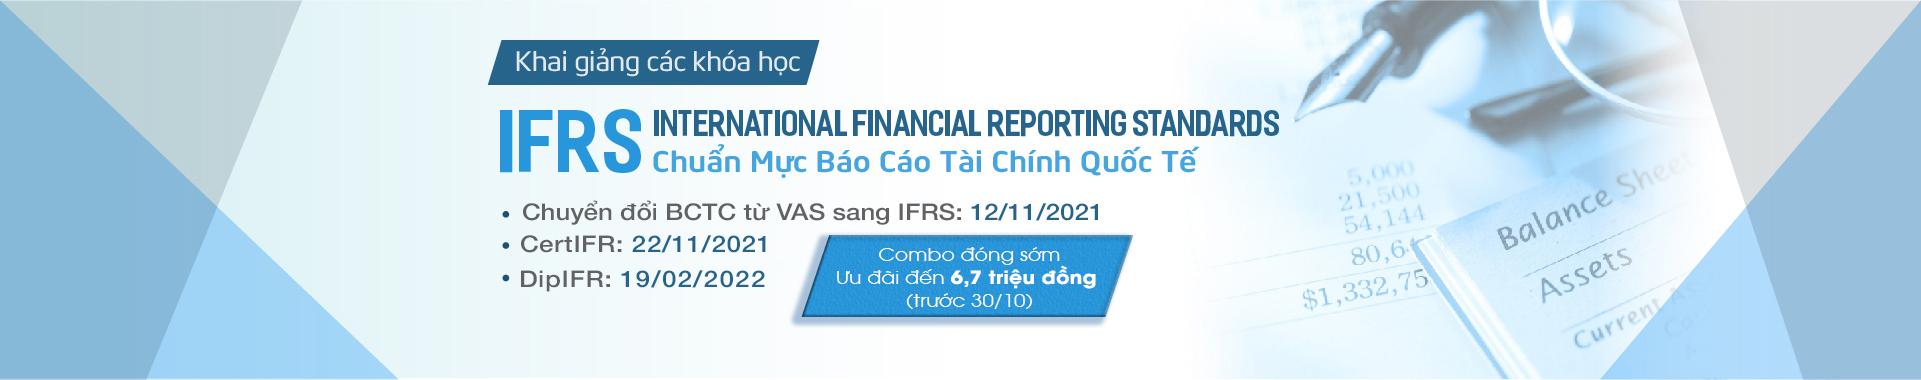 CHUAN MUC BCTC QUOC TE IFRS